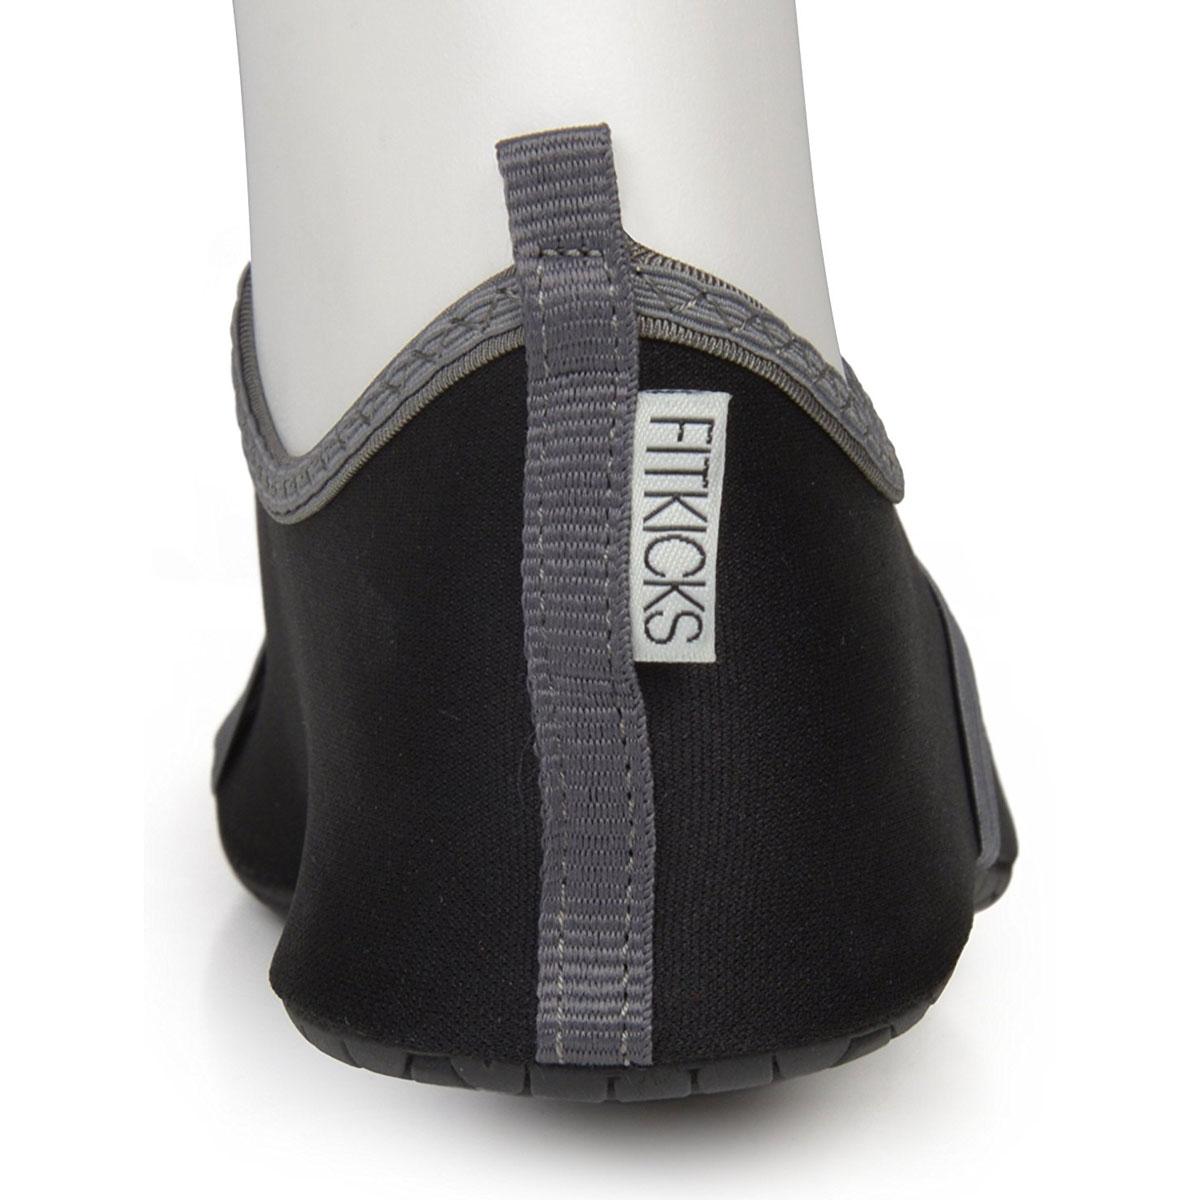 FitKicks-Women-039-s-Non-Slip-Sole-Active-Footwear thumbnail 7